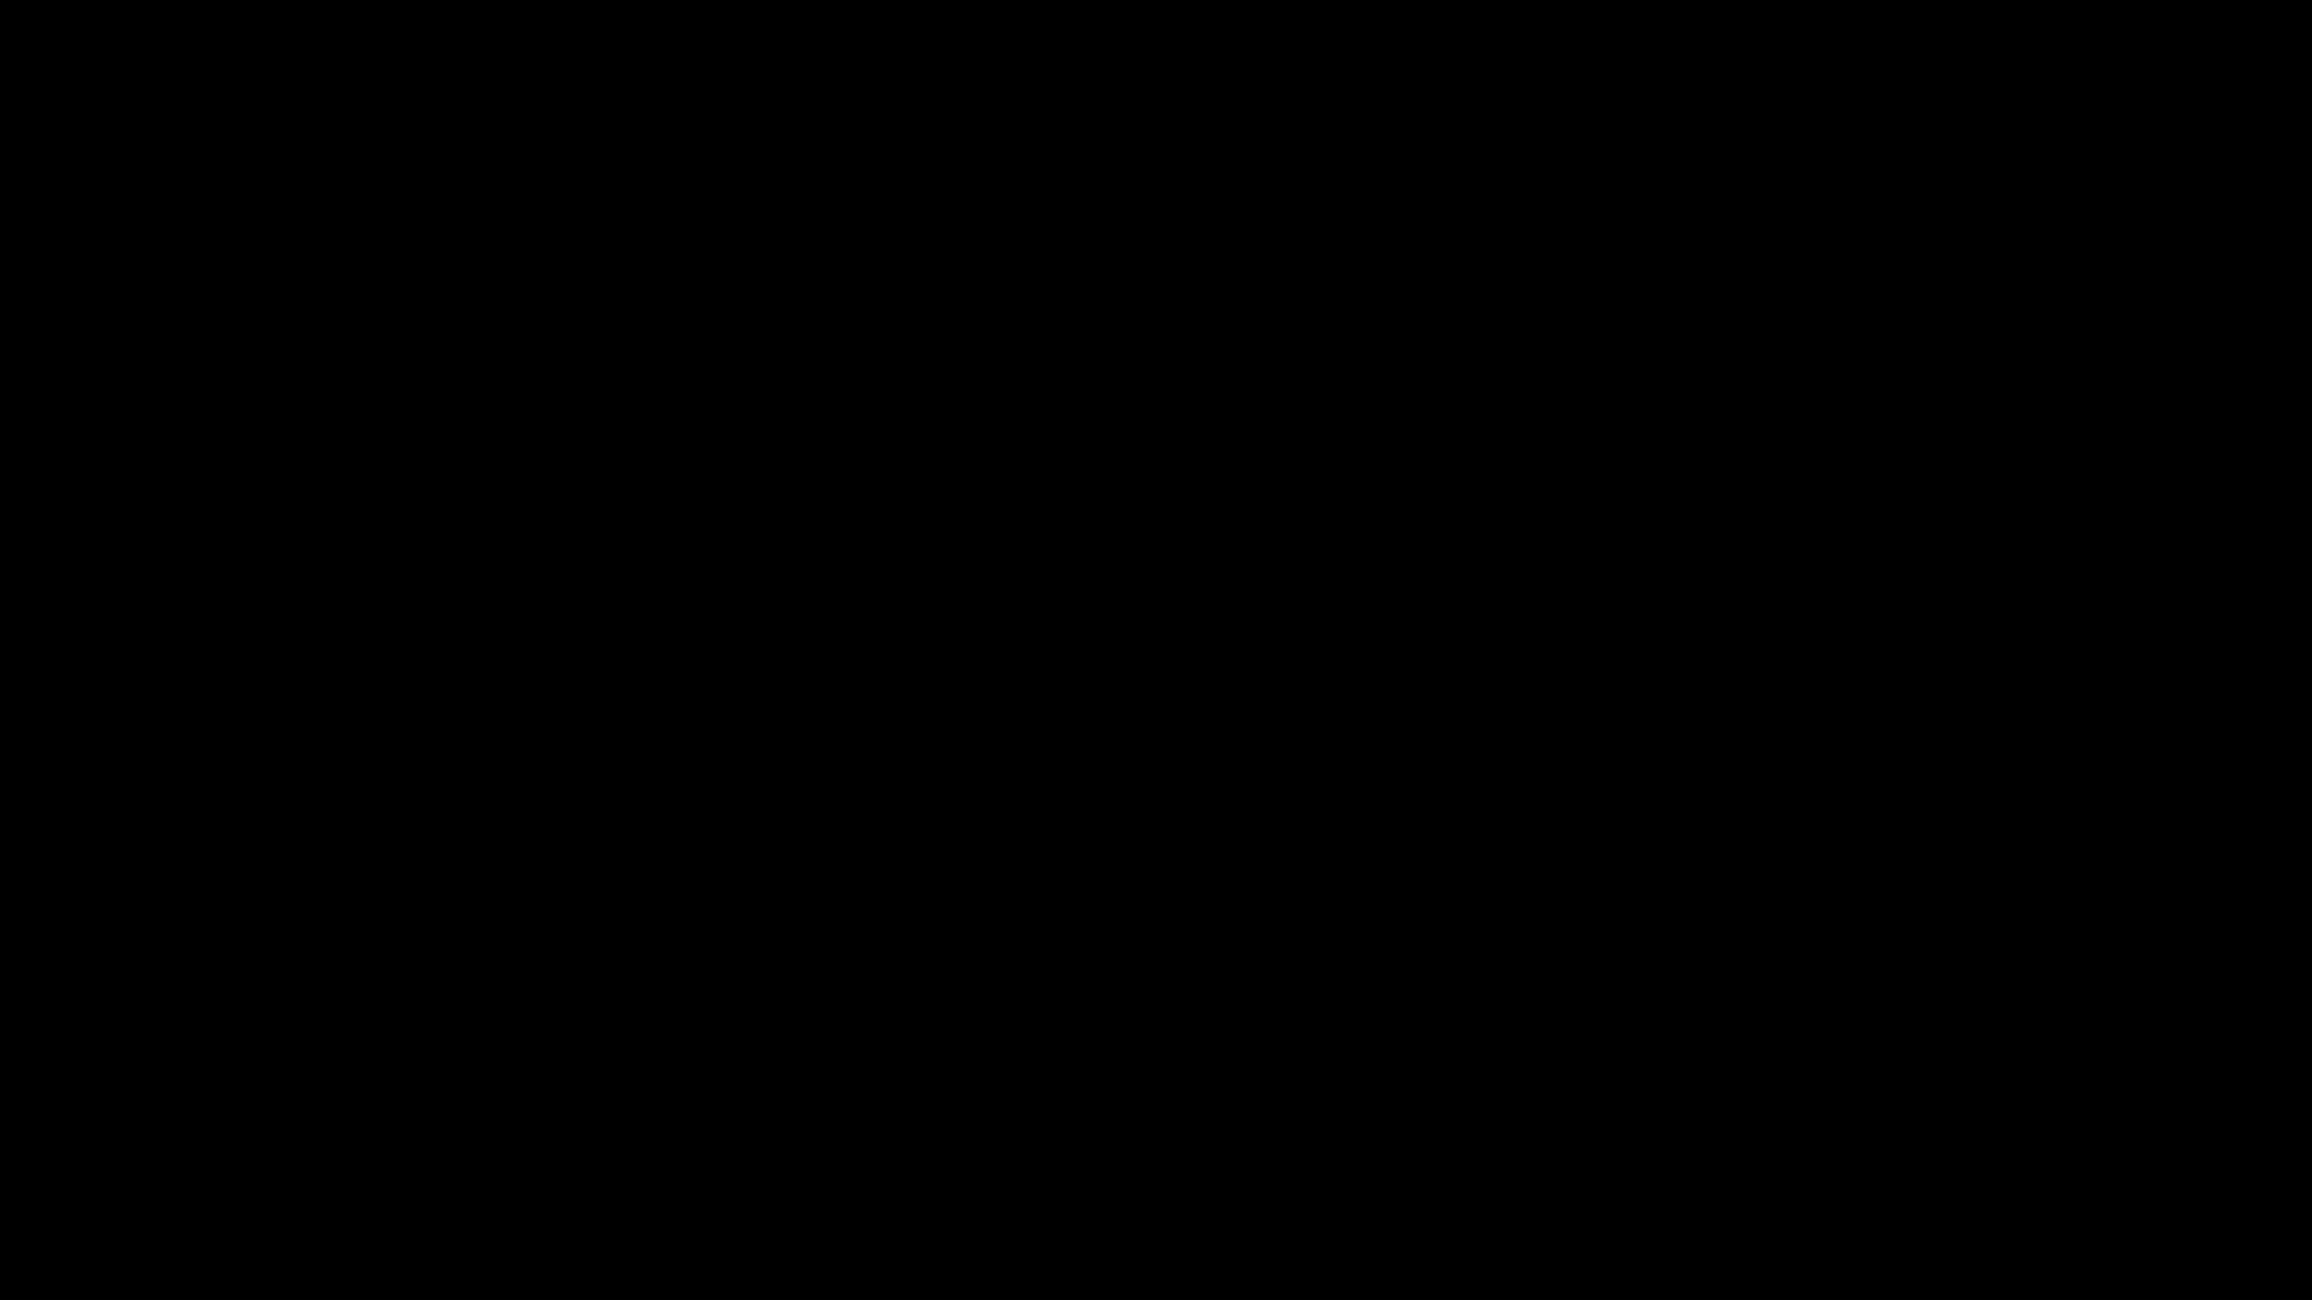 ph-reno-04_tive-04-16-9